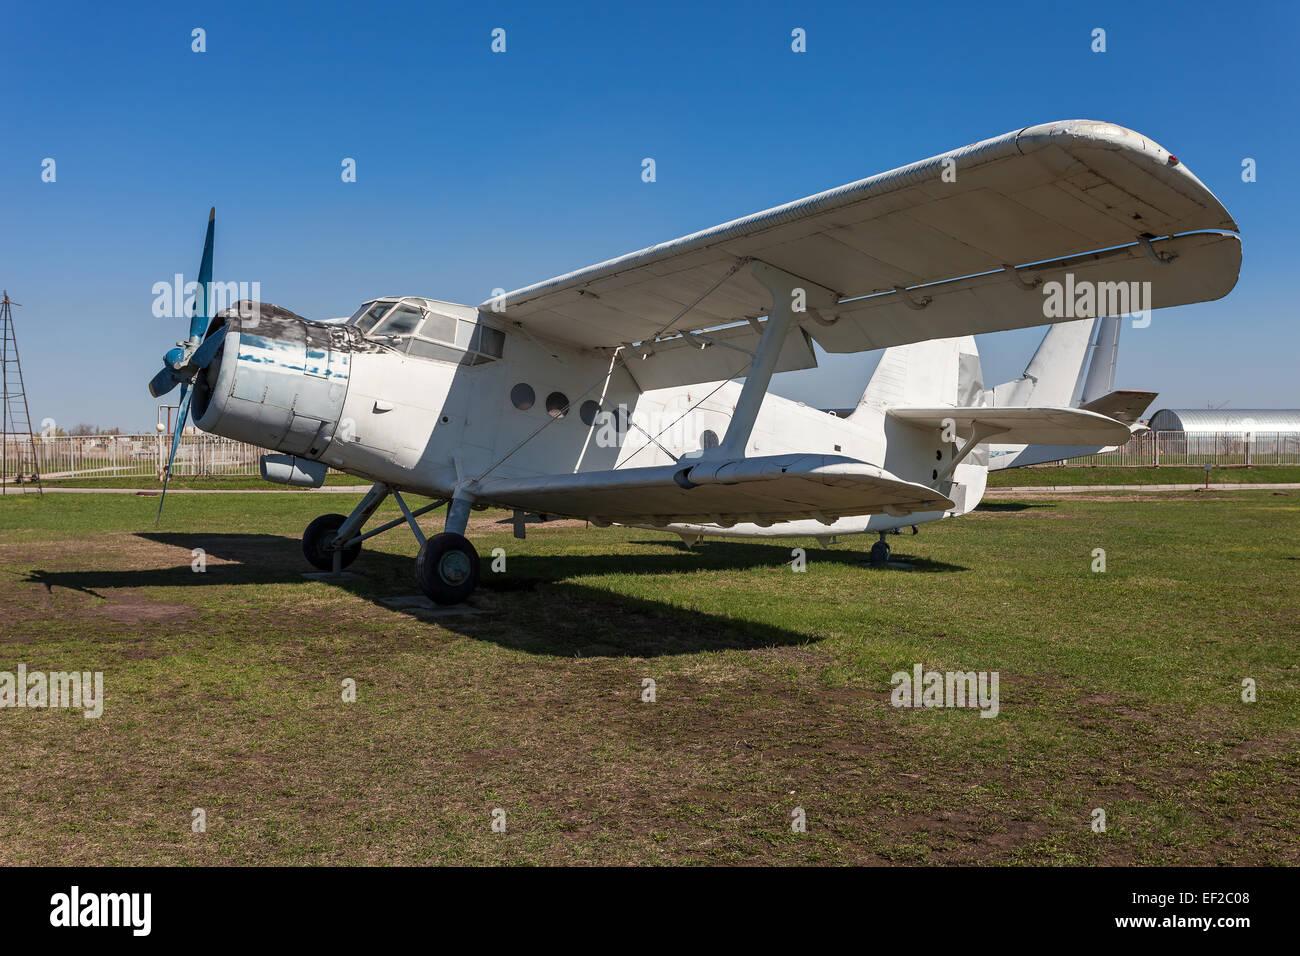 The Antonov An-2 is a Soviet mass-produced single-engine biplane in Togliatti Technical museum - Stock Image